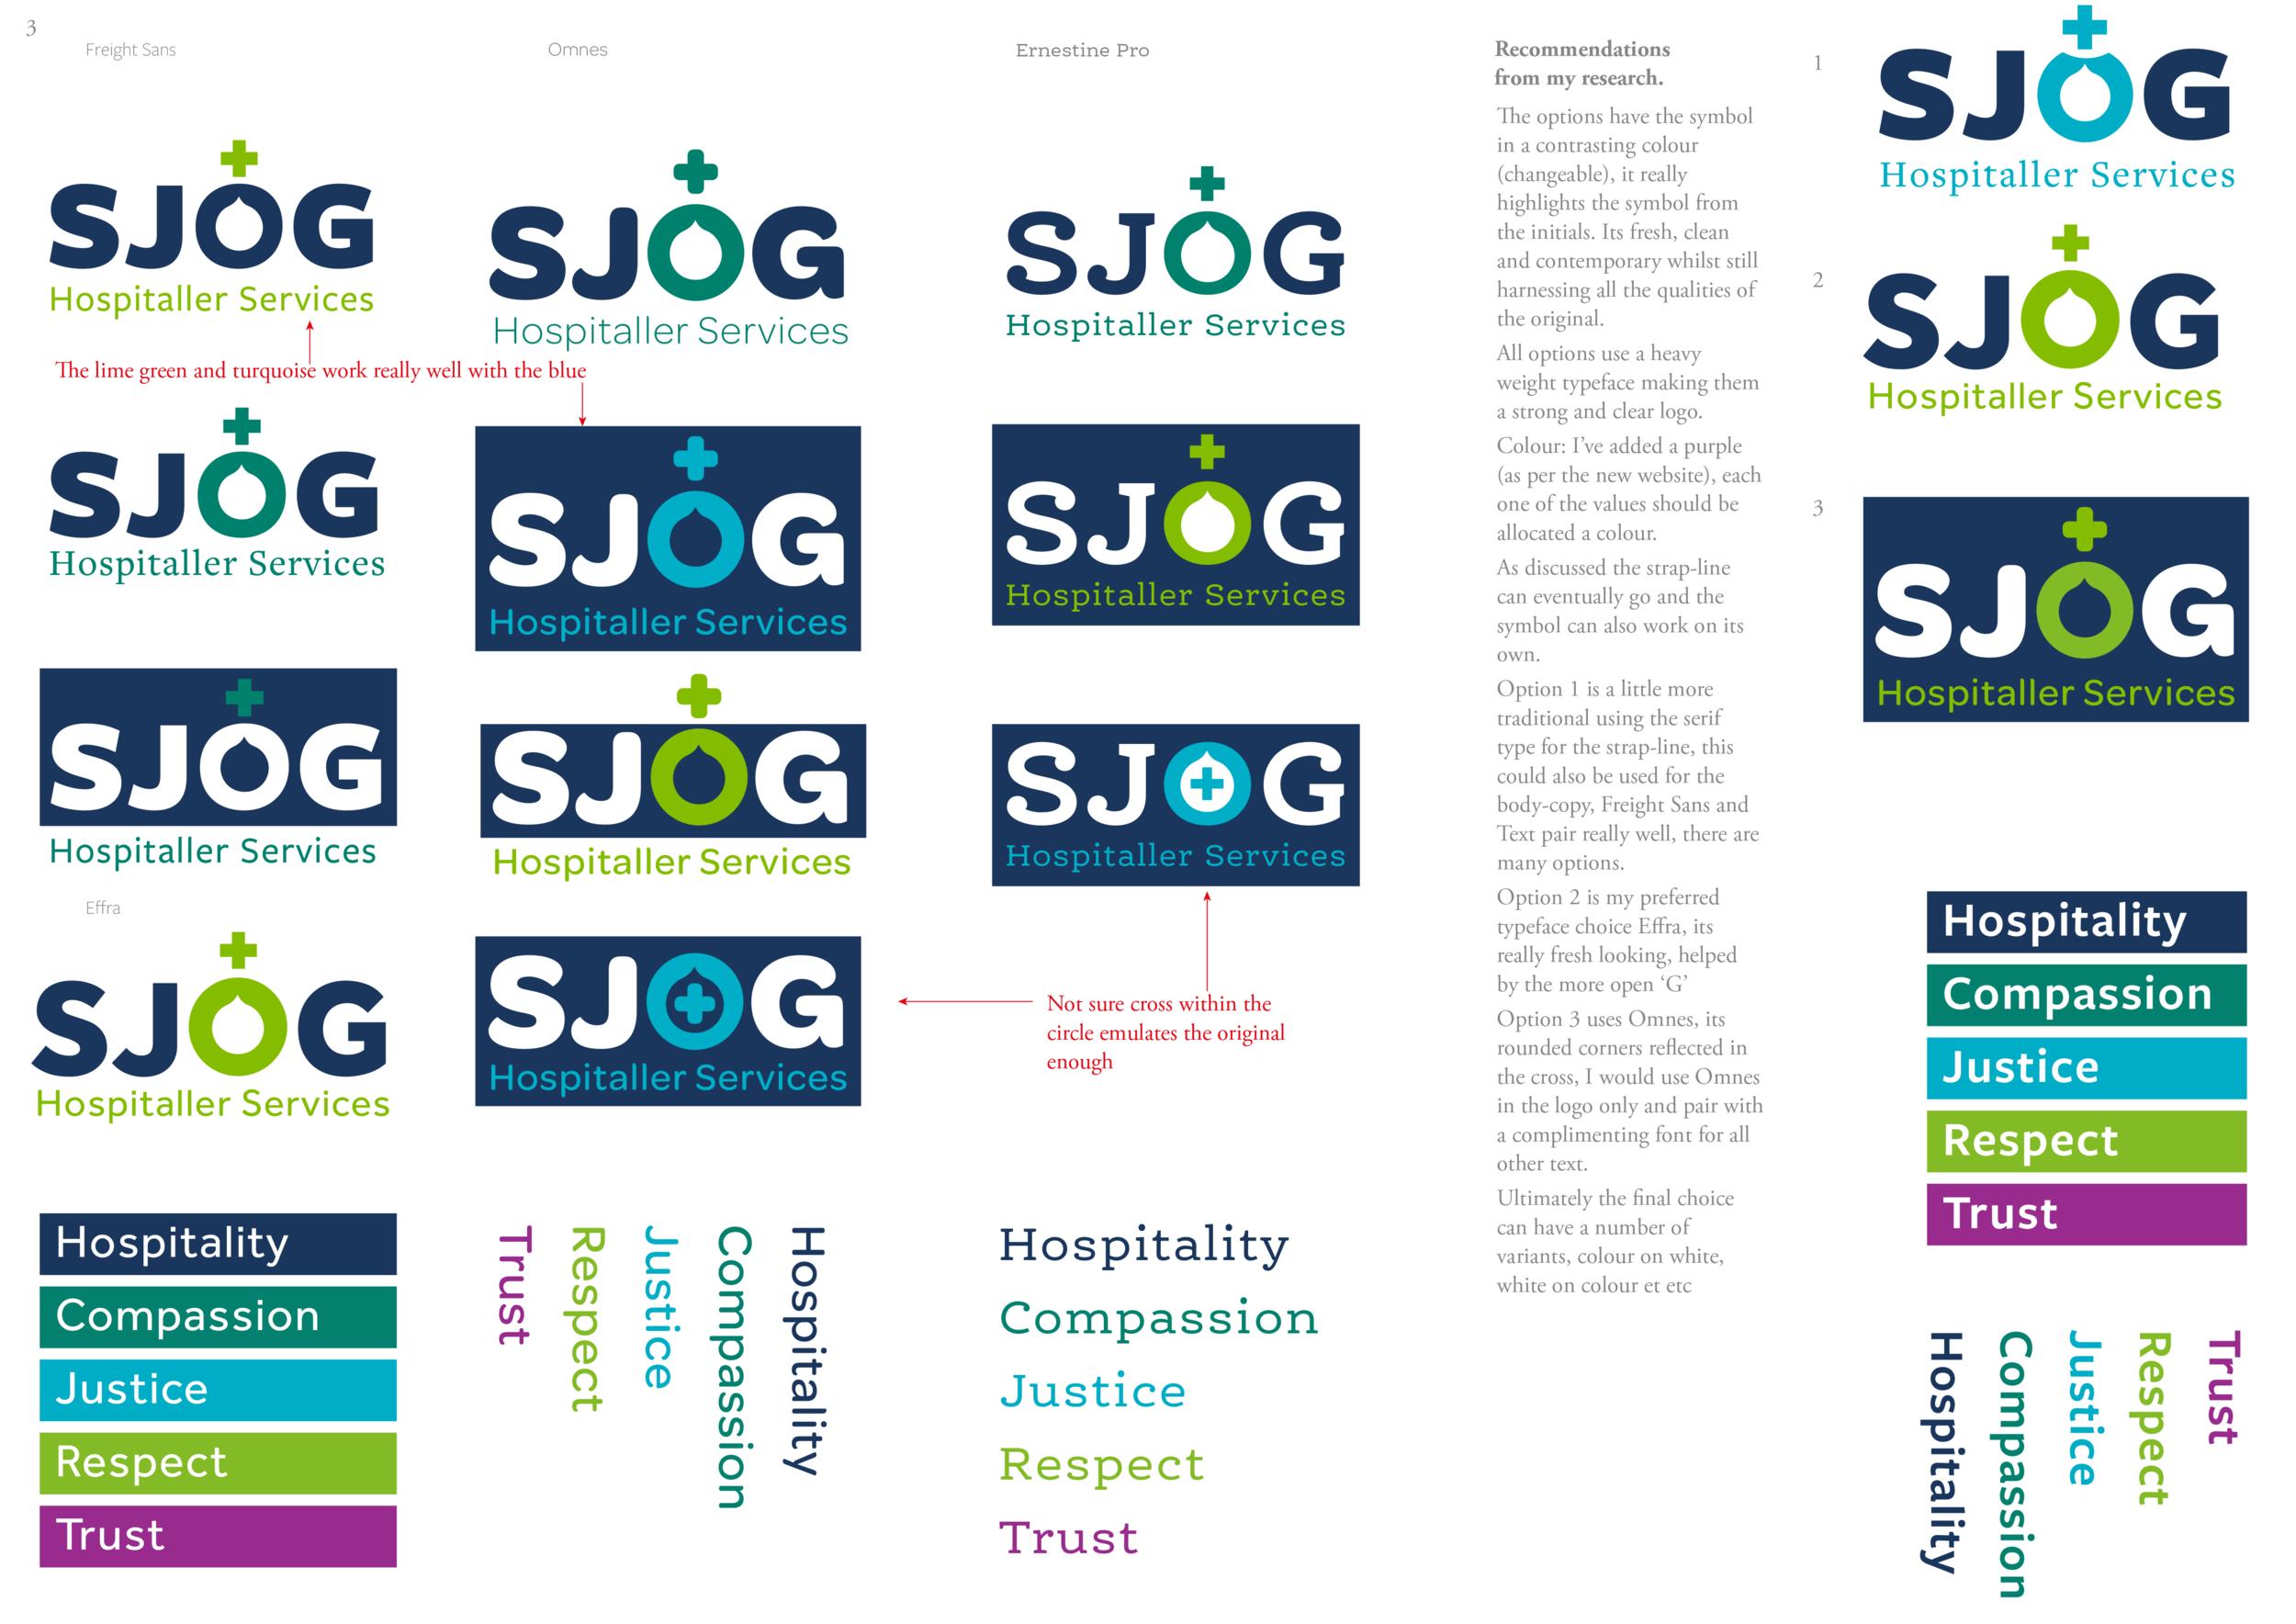 SJOG_3_initial_ideas_recommendations.png